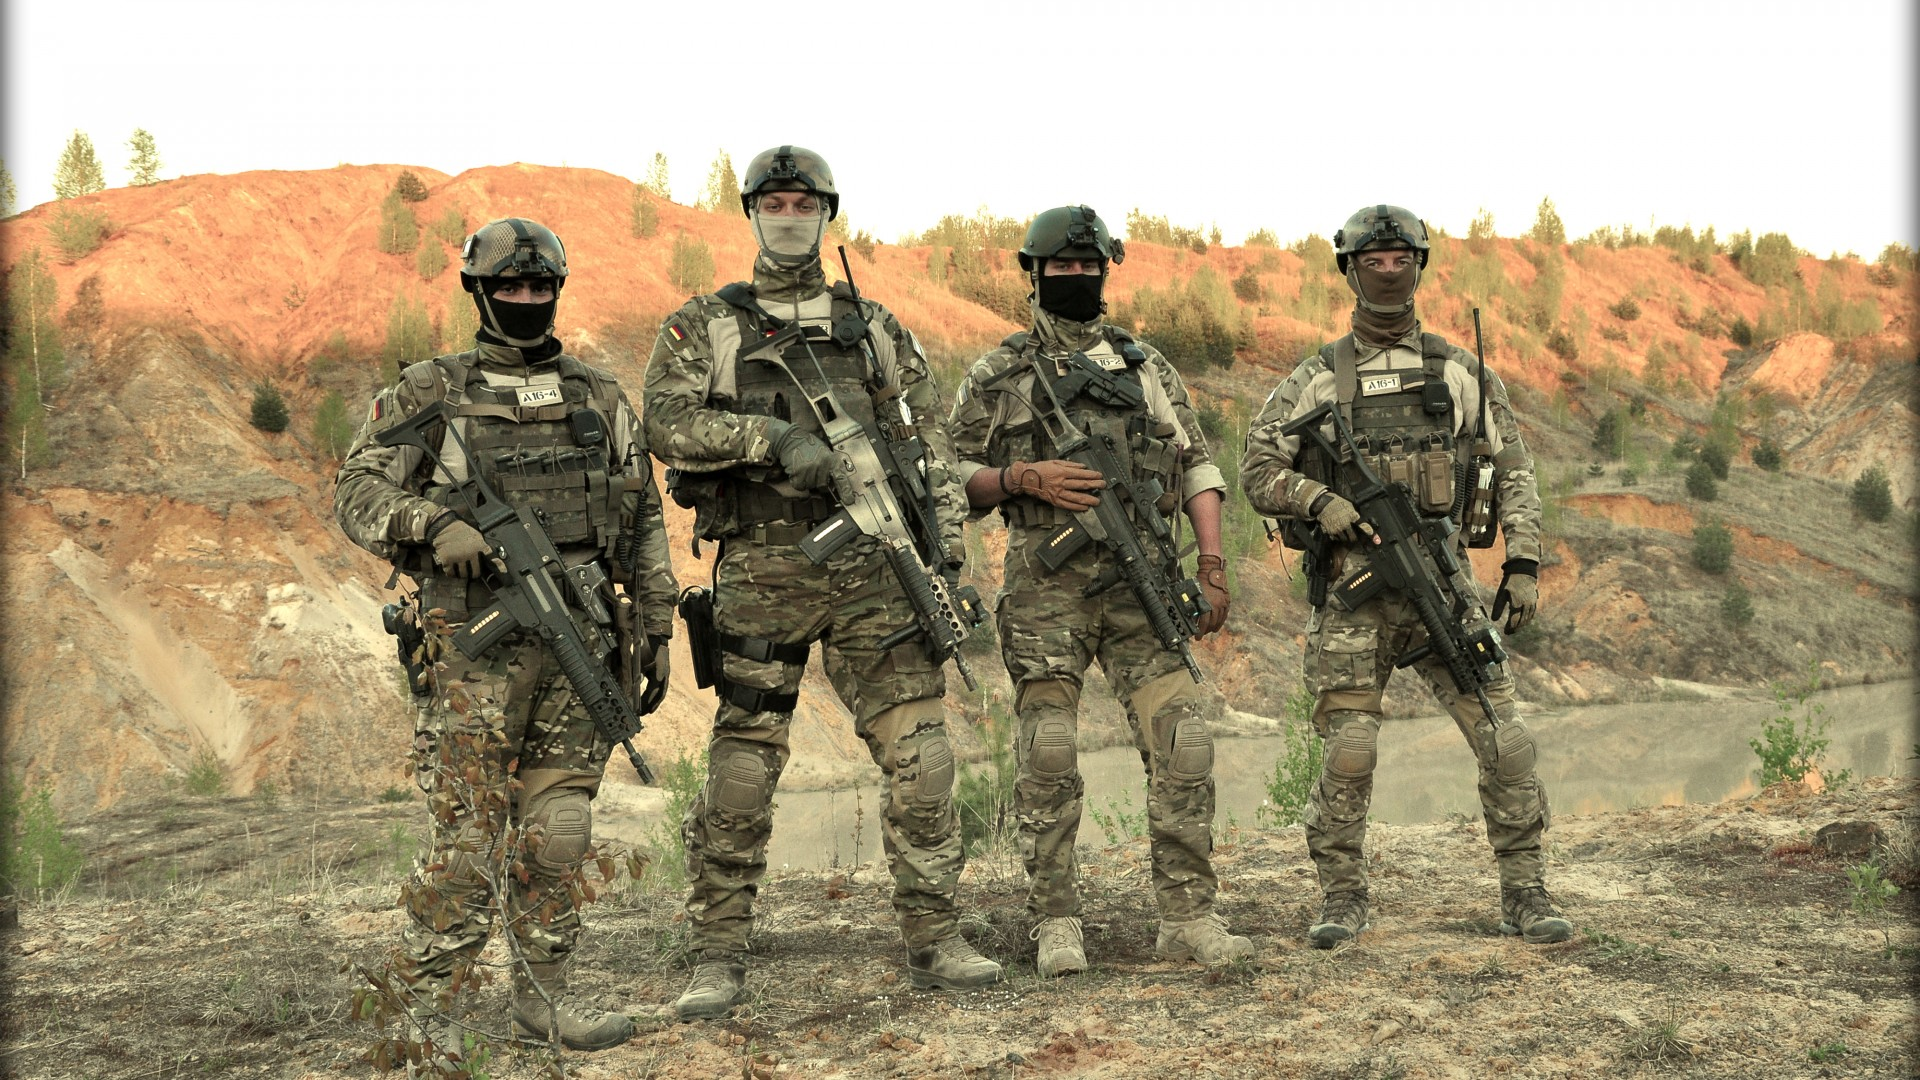 wallpaper ksk special forces kommando spezialkrafte